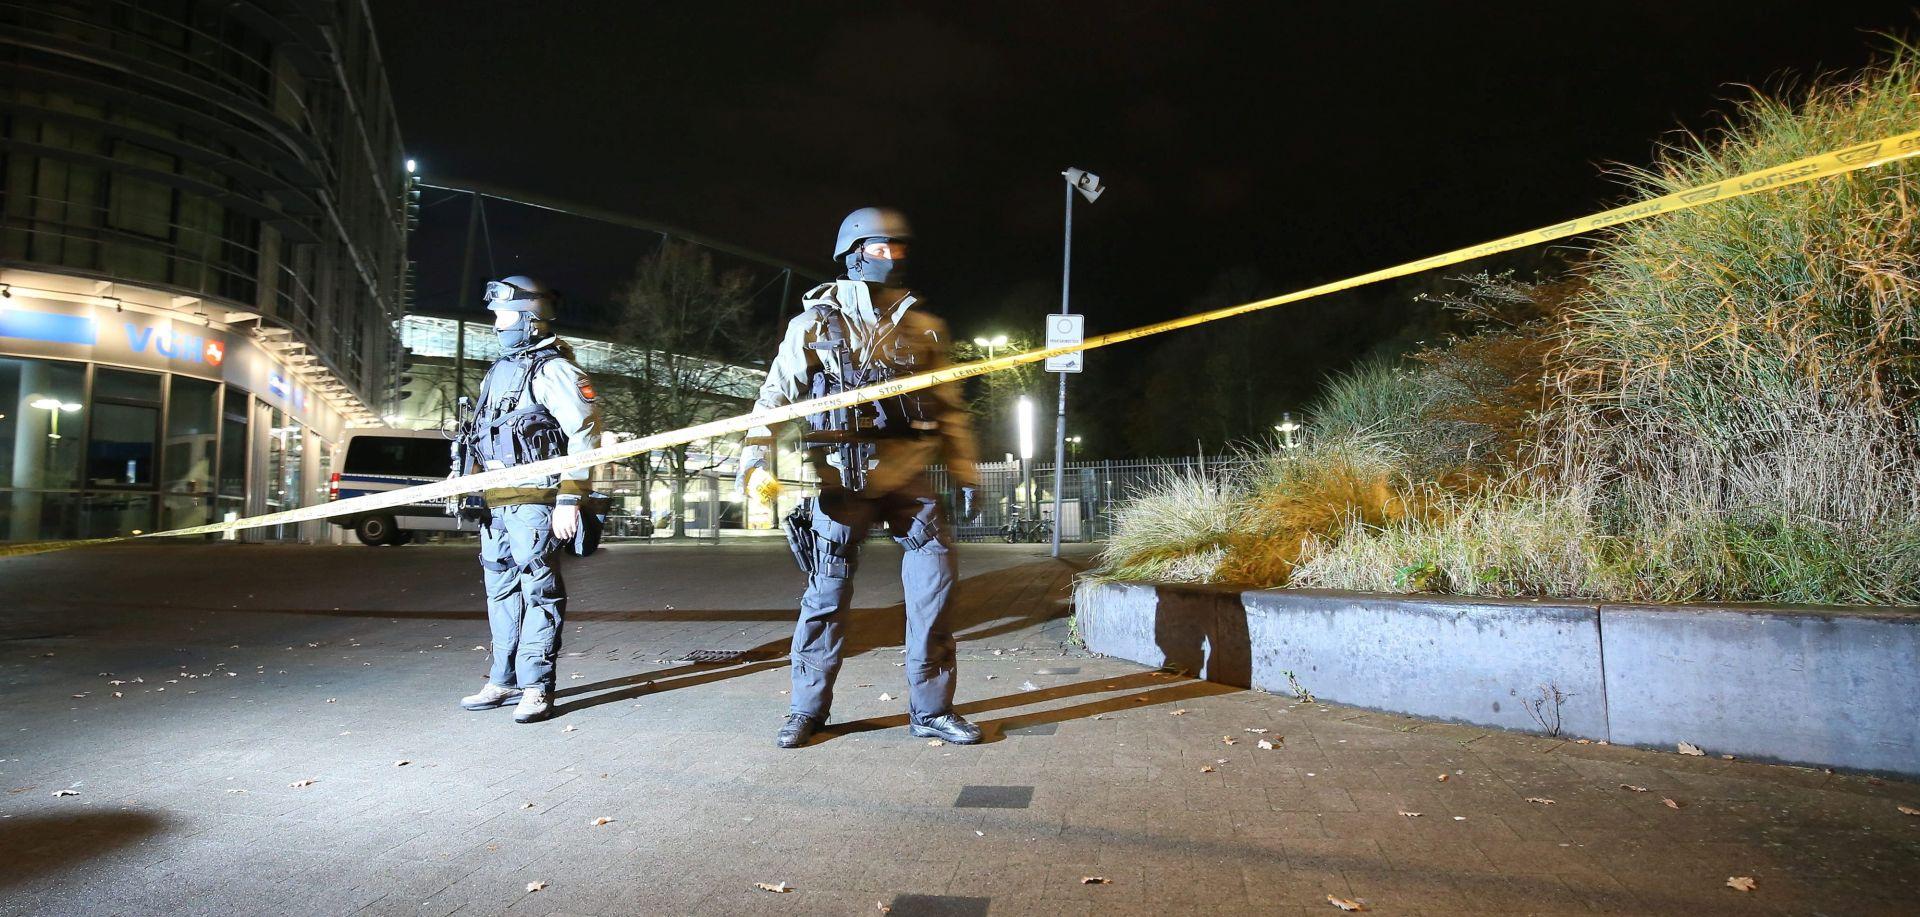 VIDEO SAINT-DENIS: Završena akcija, dvije osobe mrtve, sedam privedeno